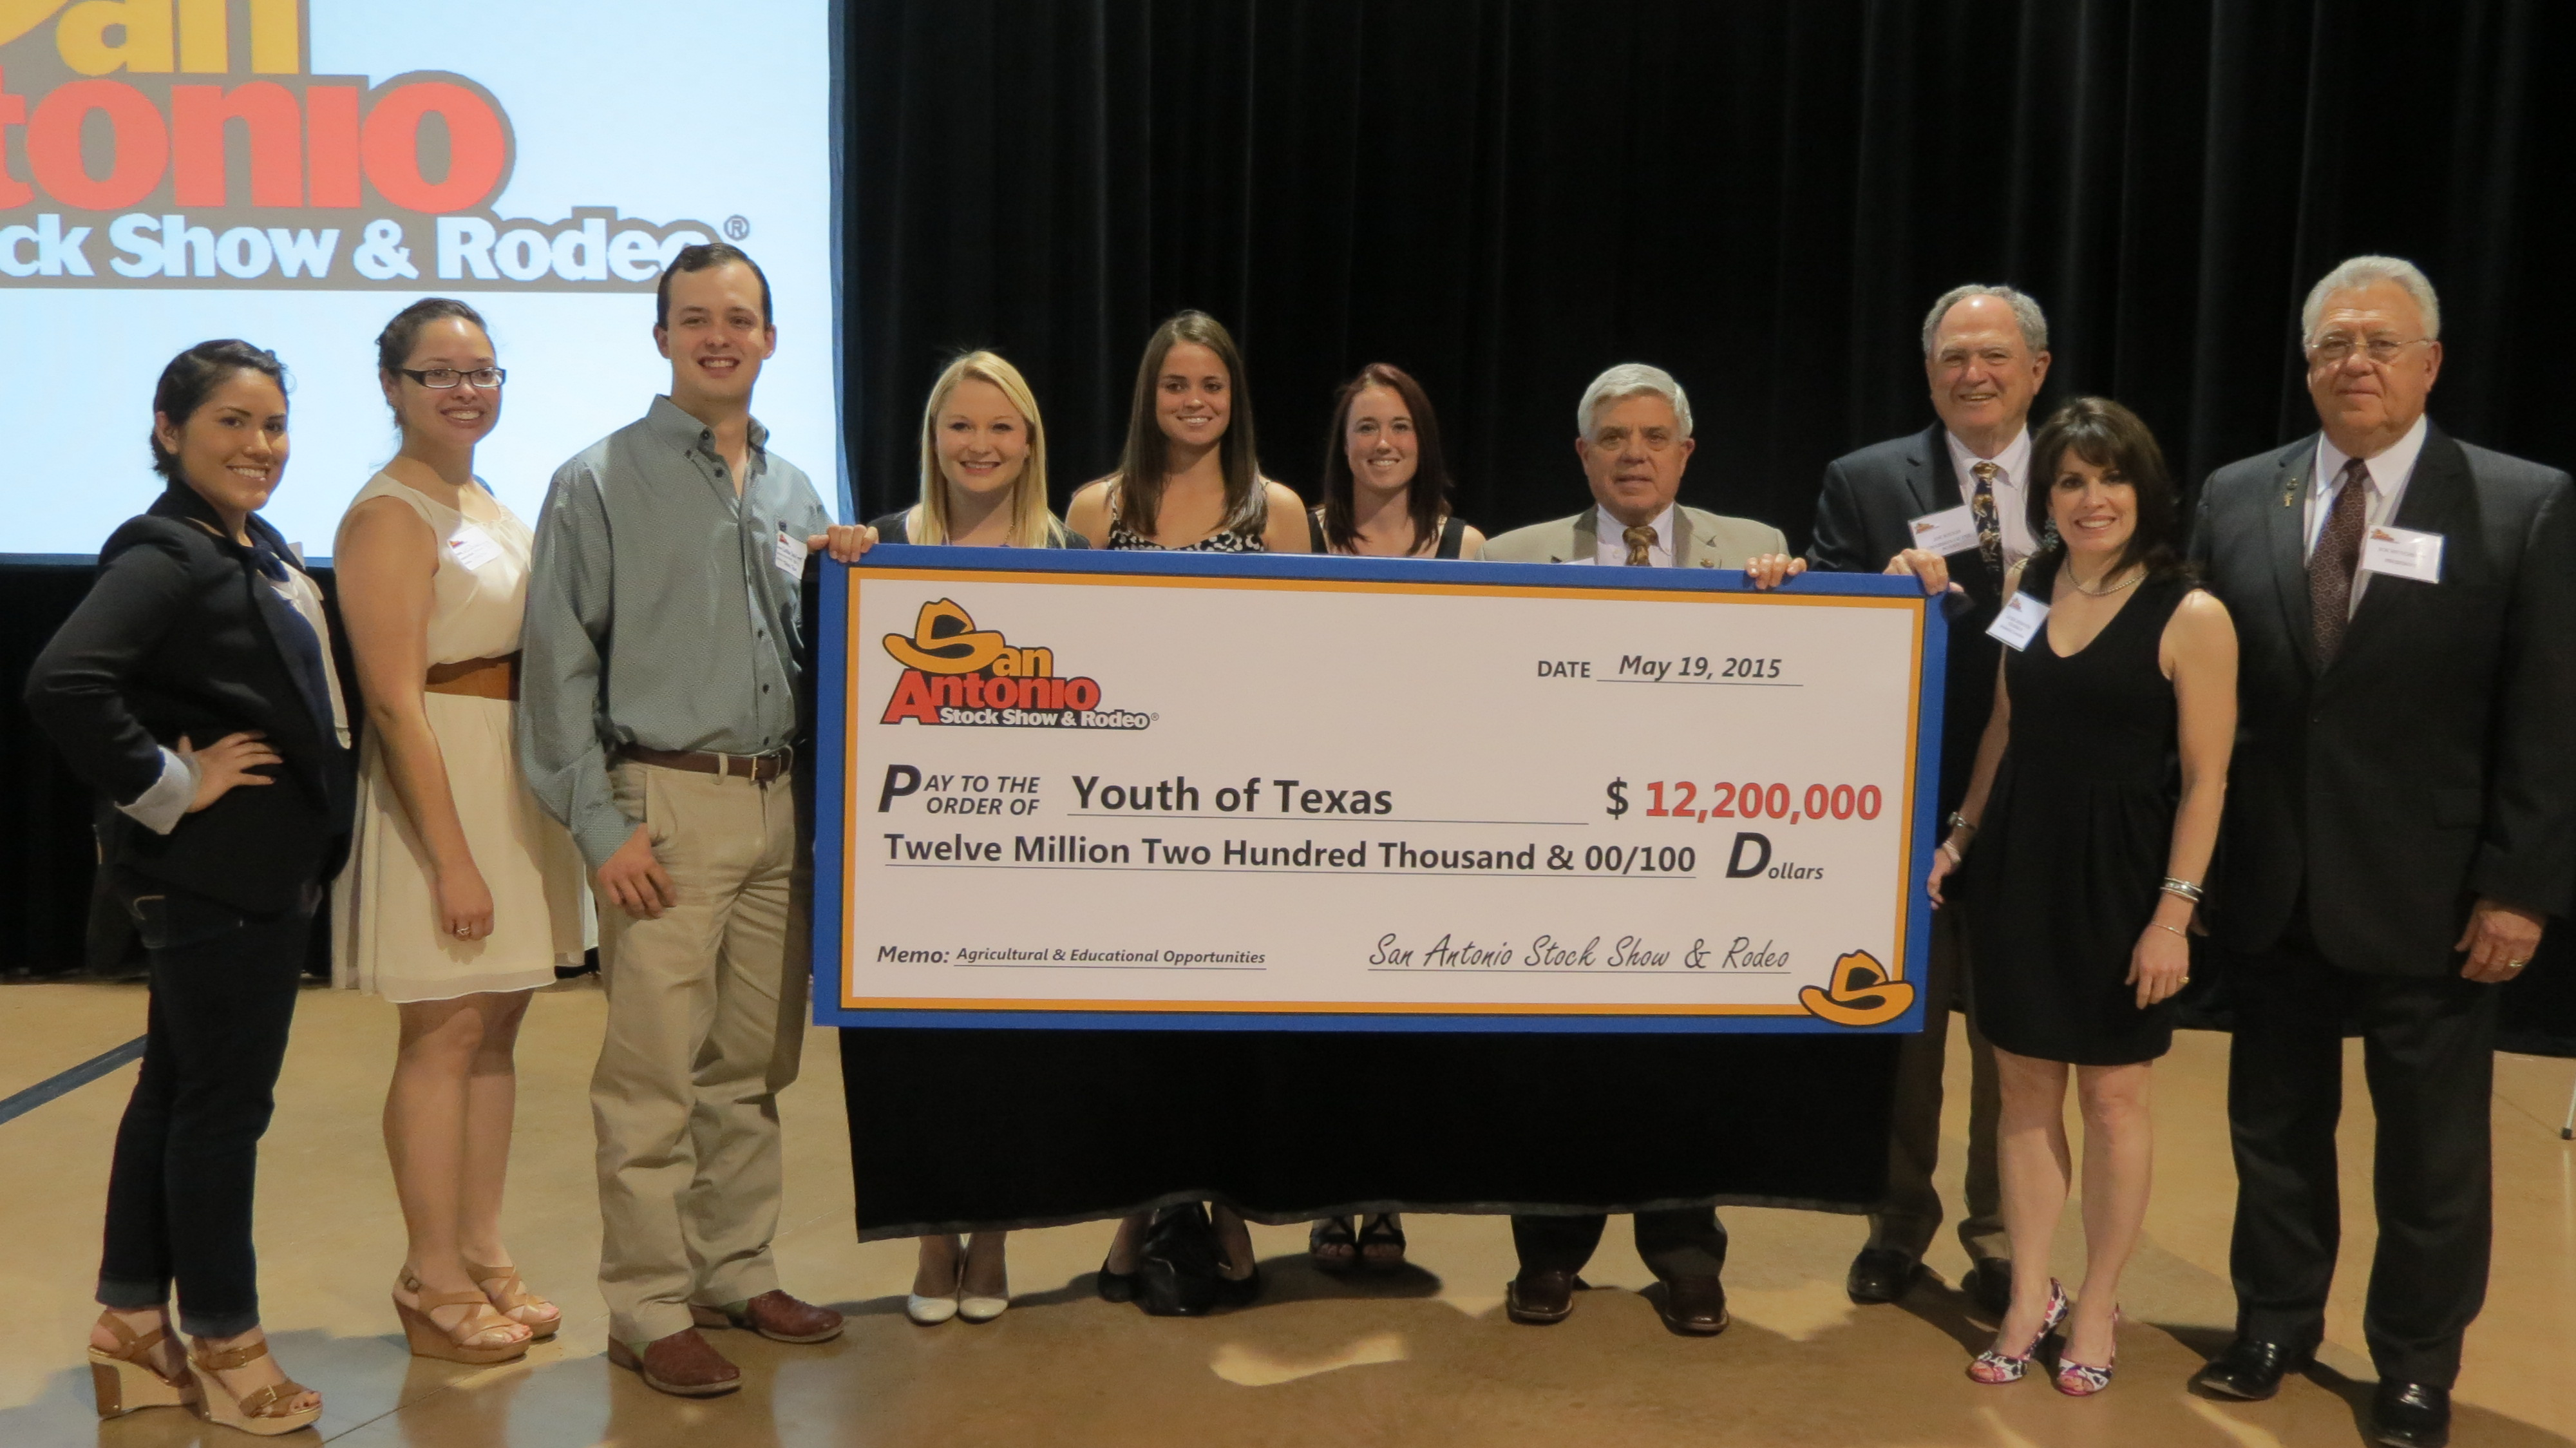 The San Antonio Stock Show Amp Rodeo Contributes 12 2